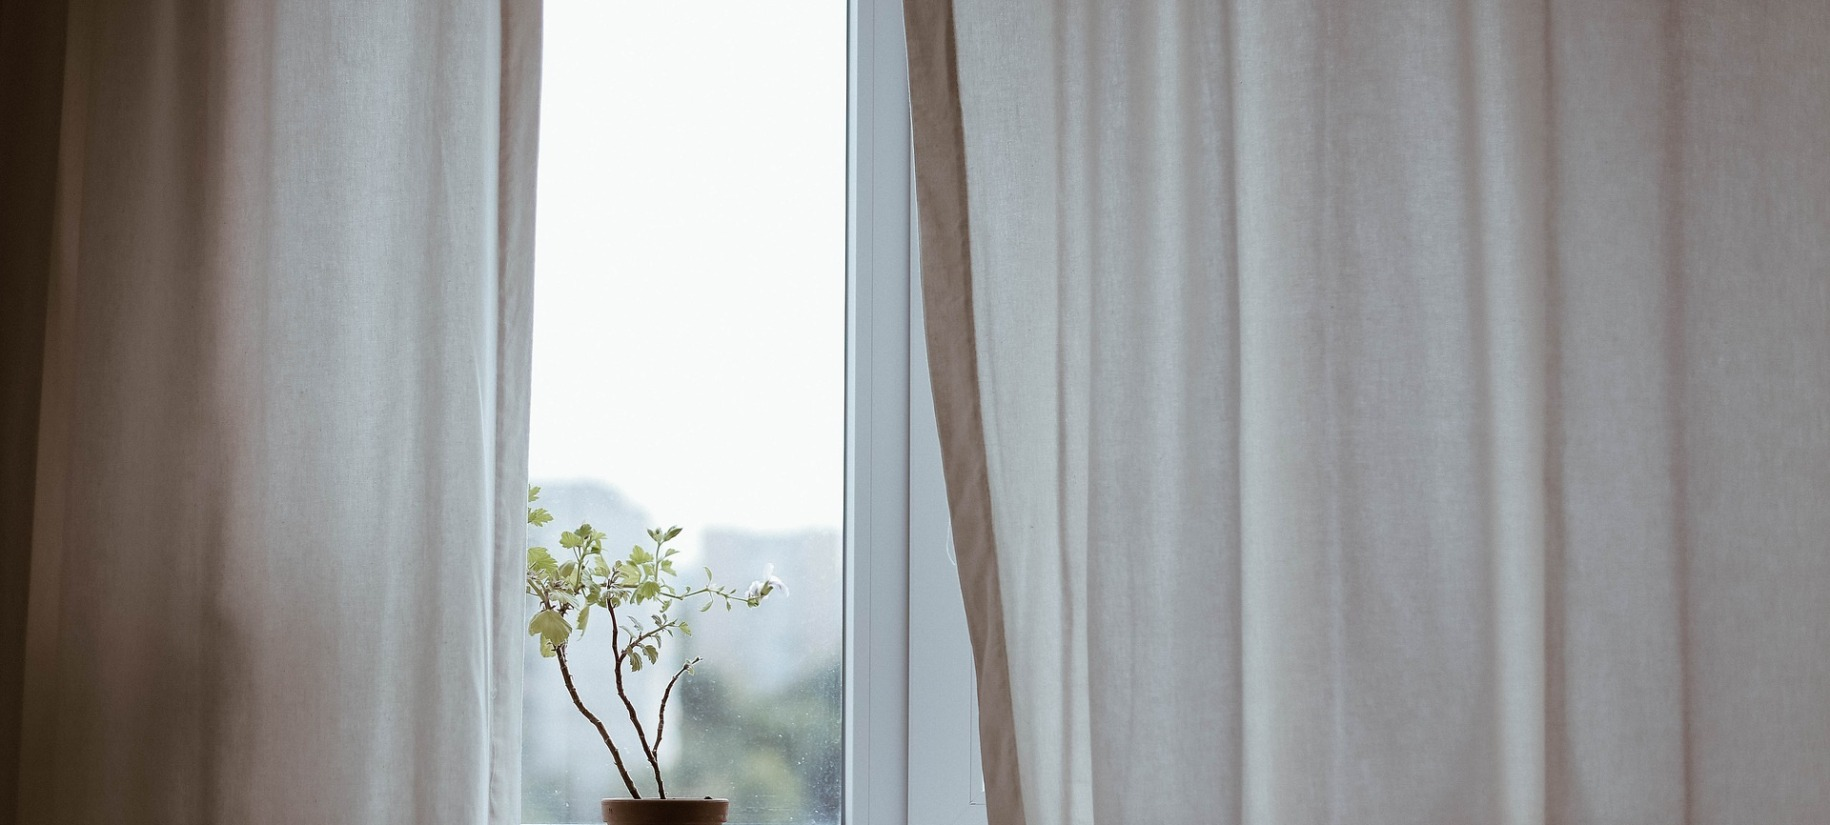 window curtains hidden